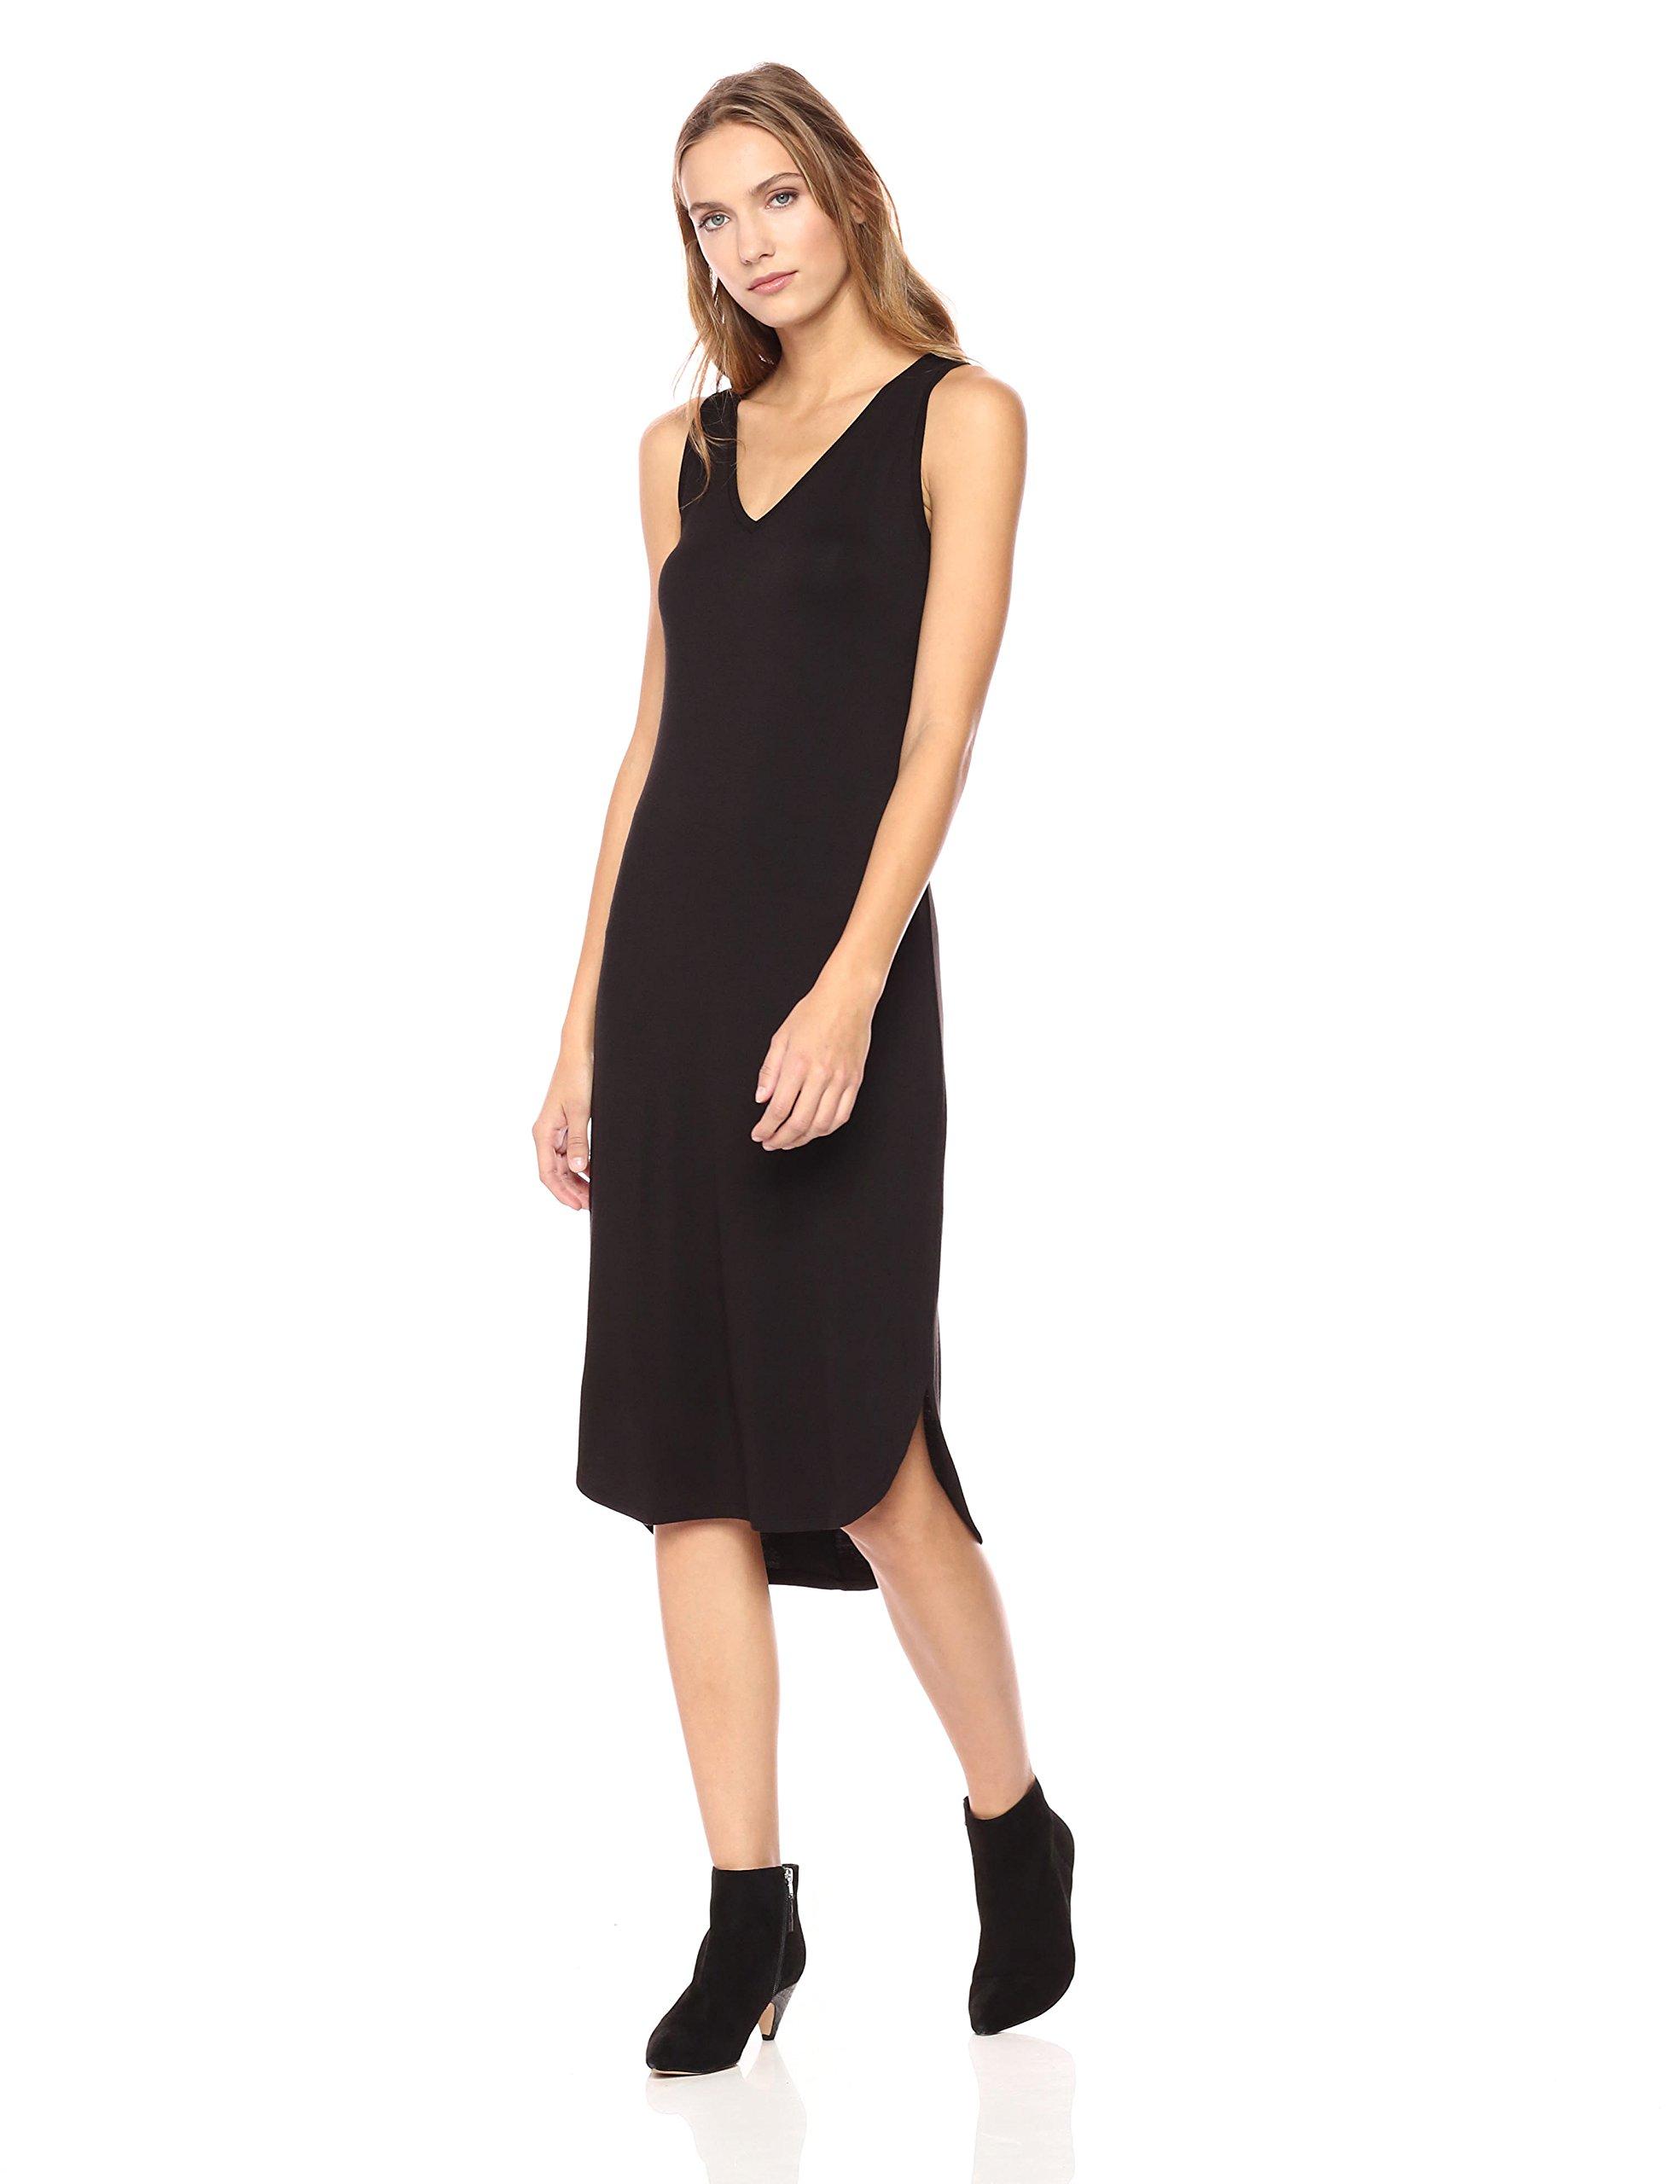 Daily Ritual Women's Jersey Sleeveless V-Neck Dress, XL, Black